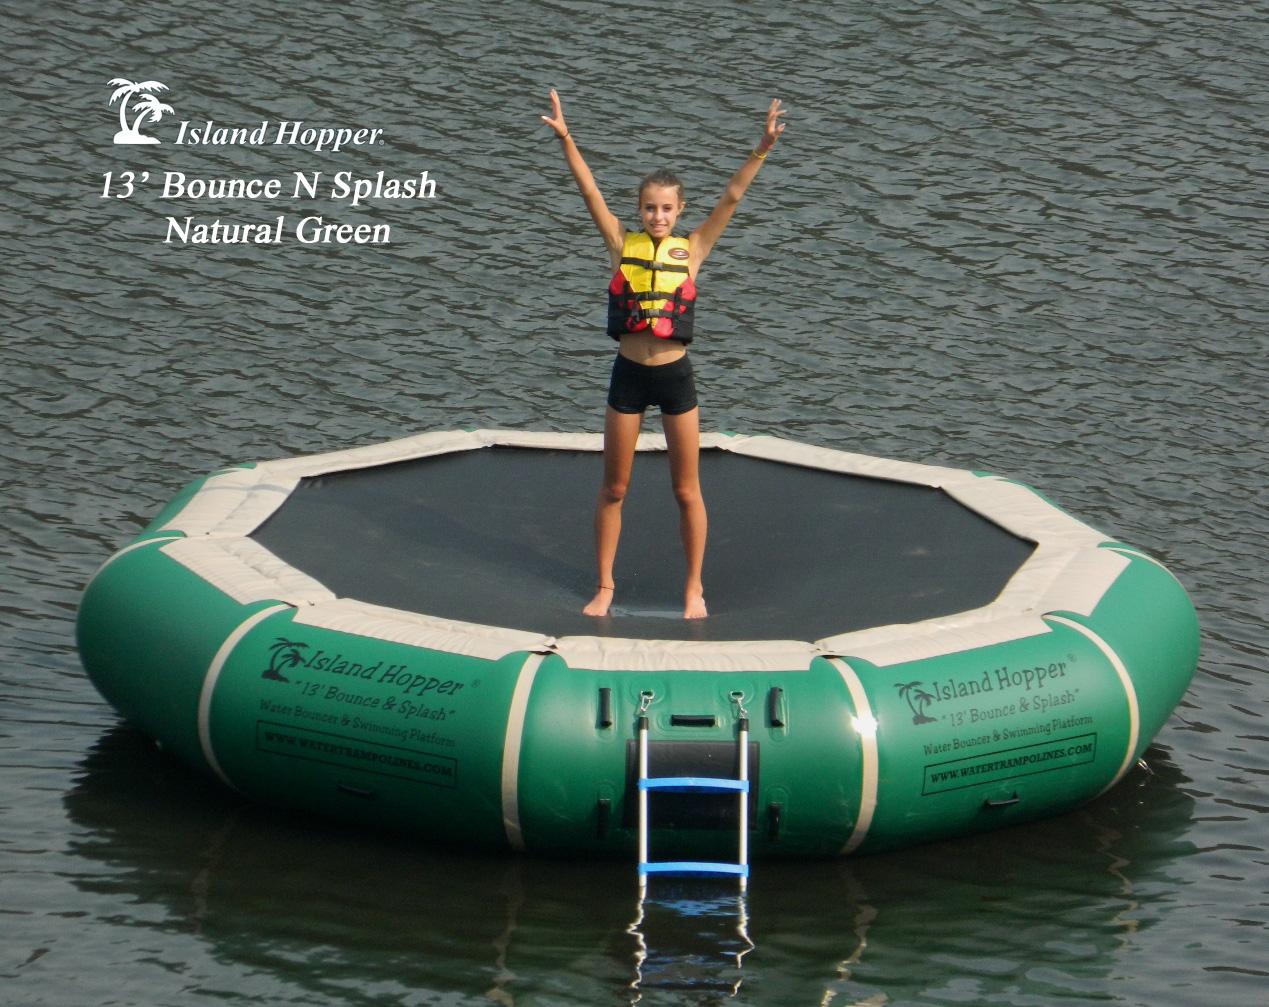 13 Foot Island Hopper Bounce N Splash Water Trampoline in Natural Green